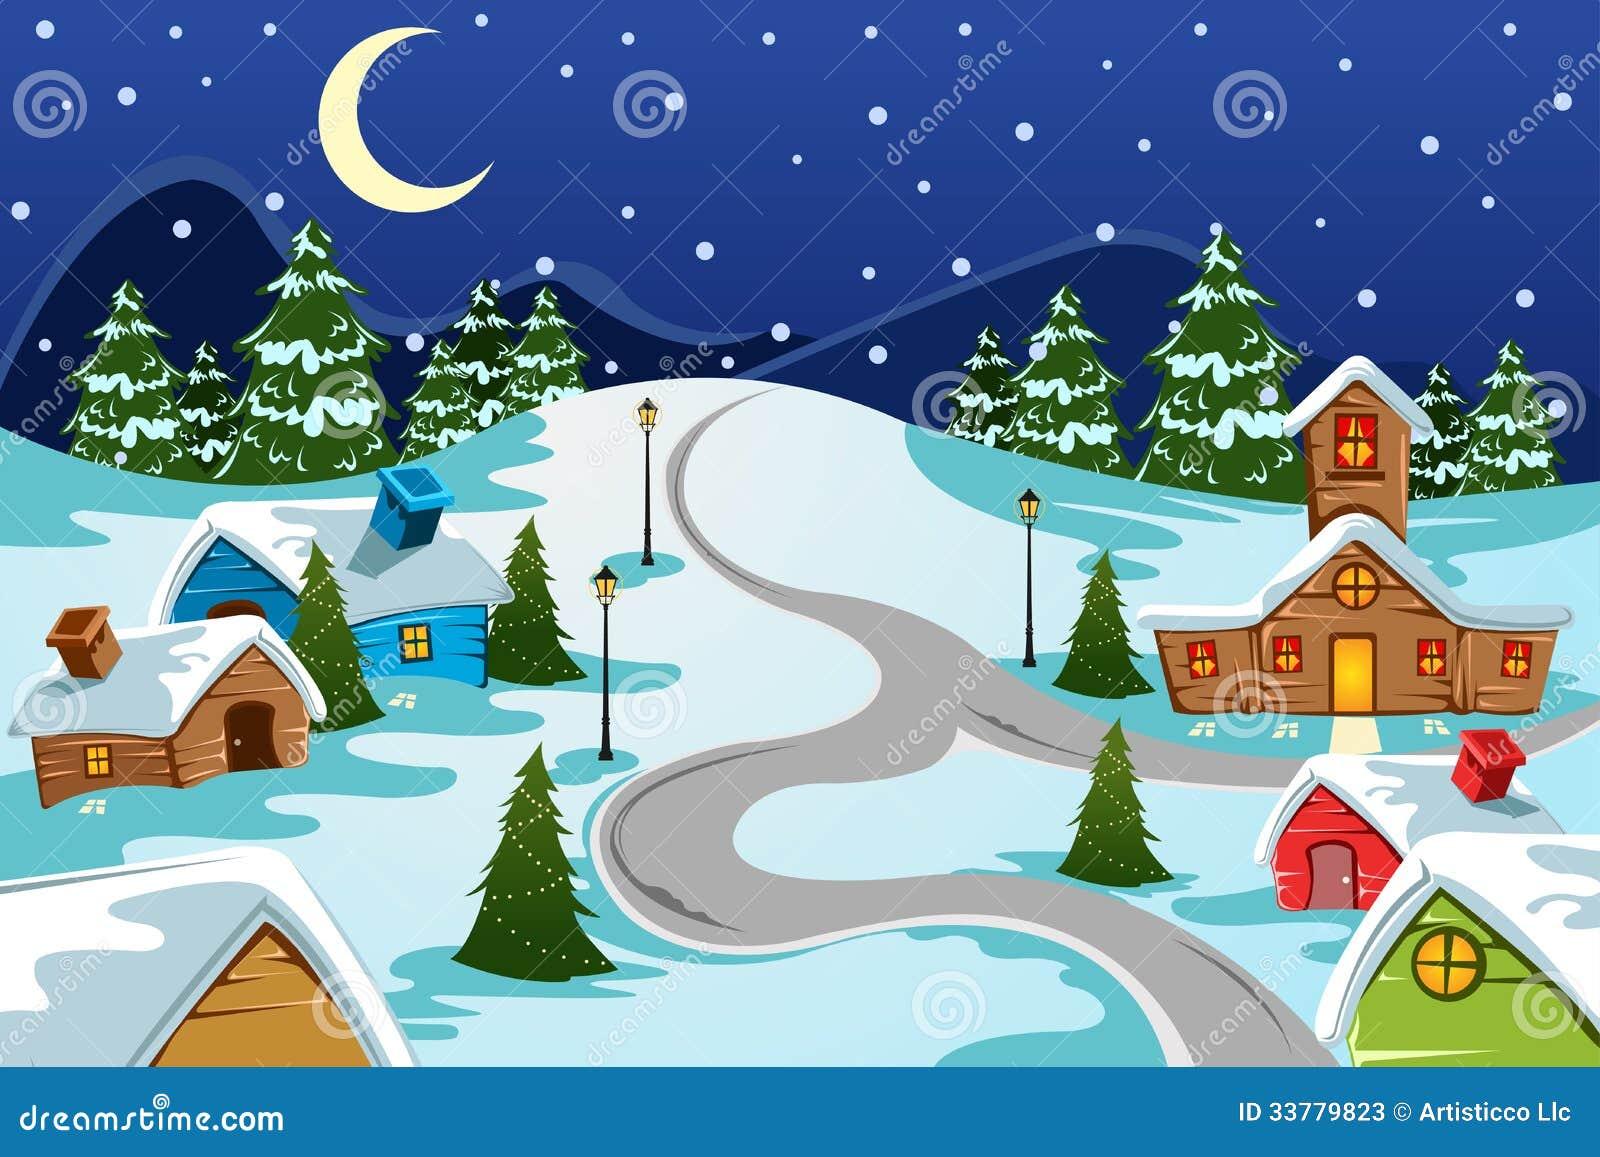 free christmas village clipart - photo #30